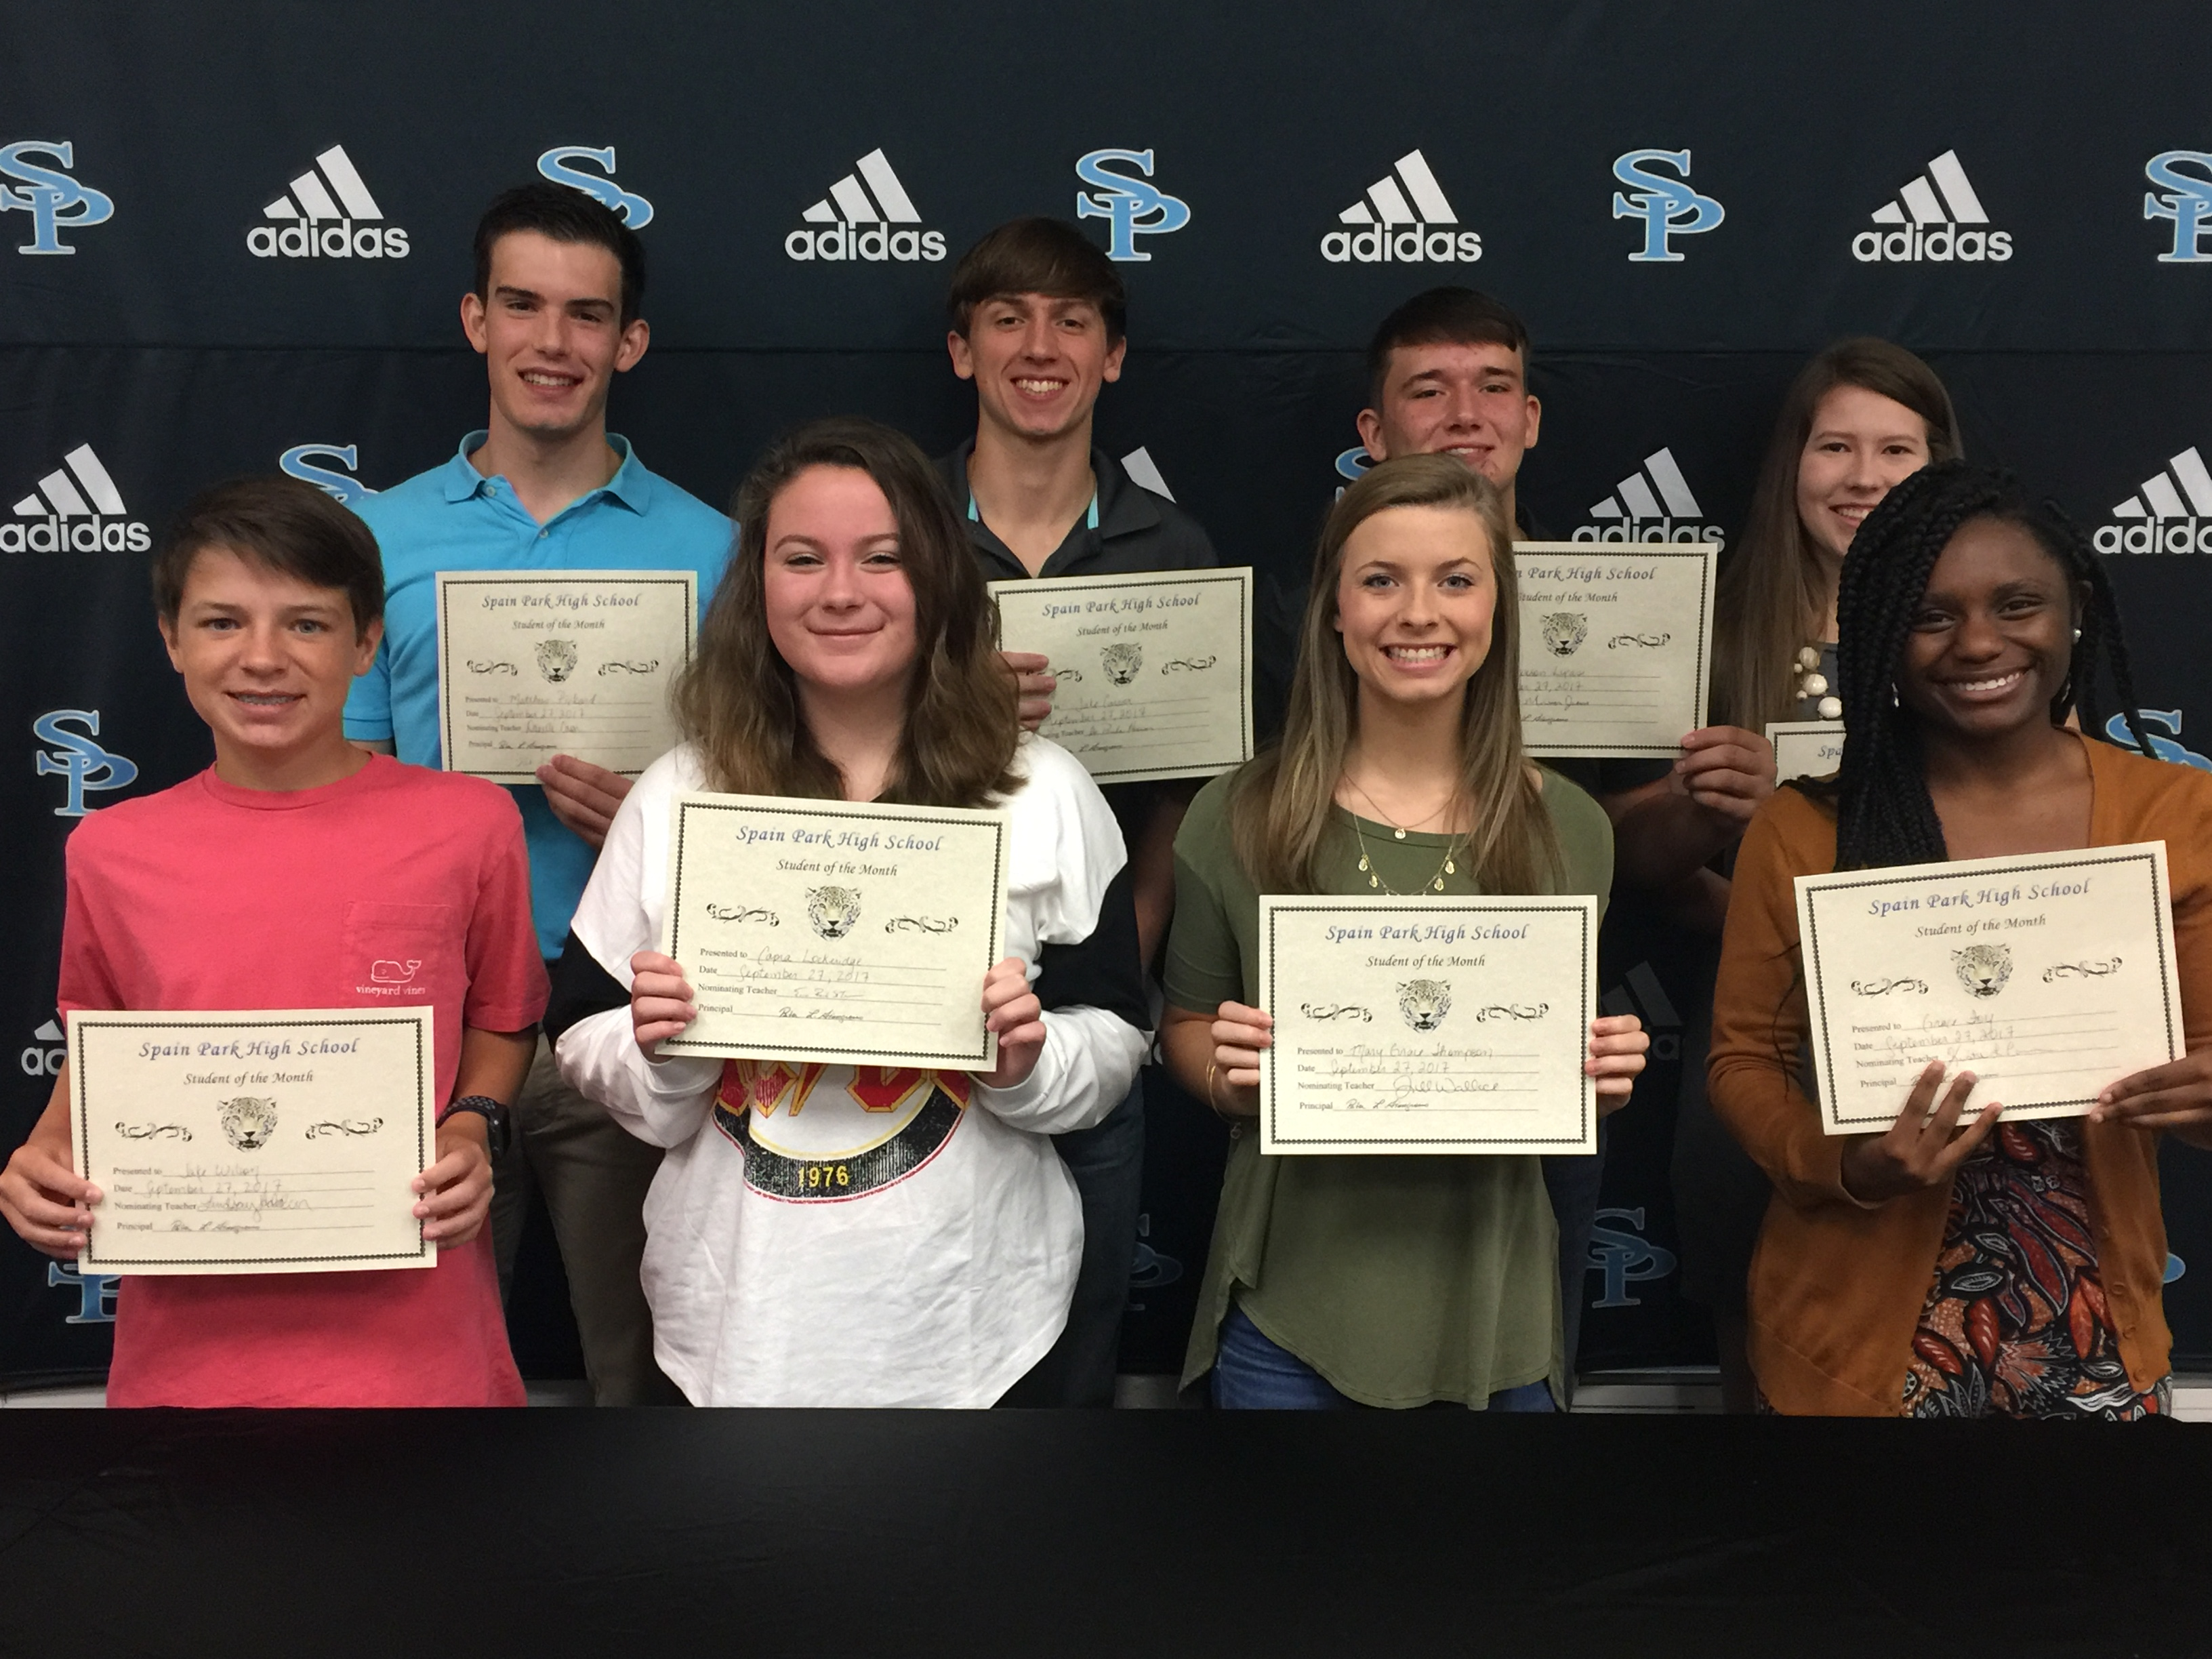 Students of the Month; Capra Lockeridge, Jake Wilson, Grace Foy, Jaxson Lucas, Mary Grace Thompson, Jake Carver, Grayson Bartlett, and Matthew Pickard.